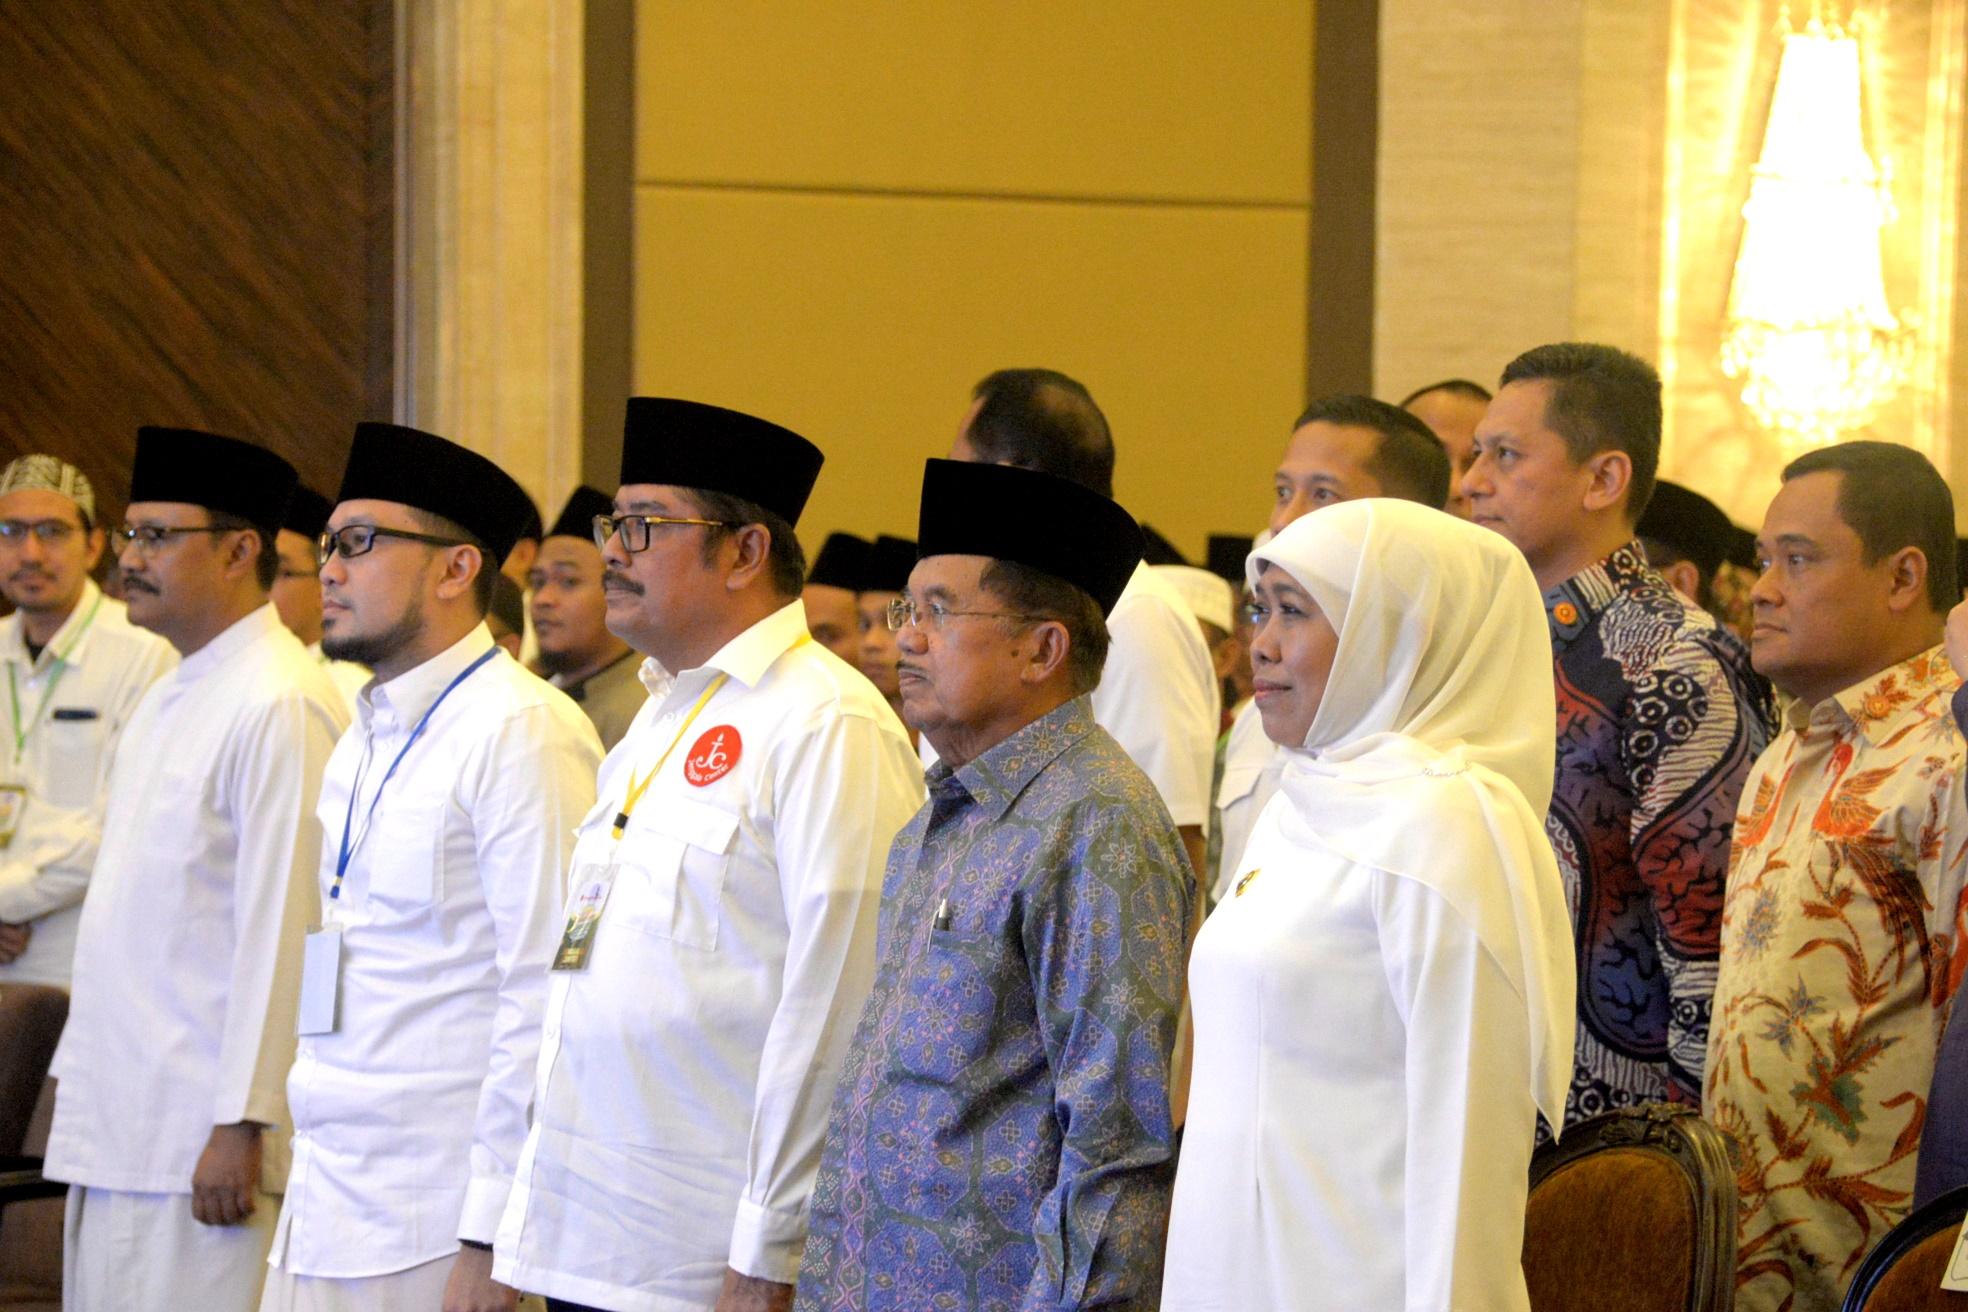 Forum Silaturahmi Gawagis Nusantara